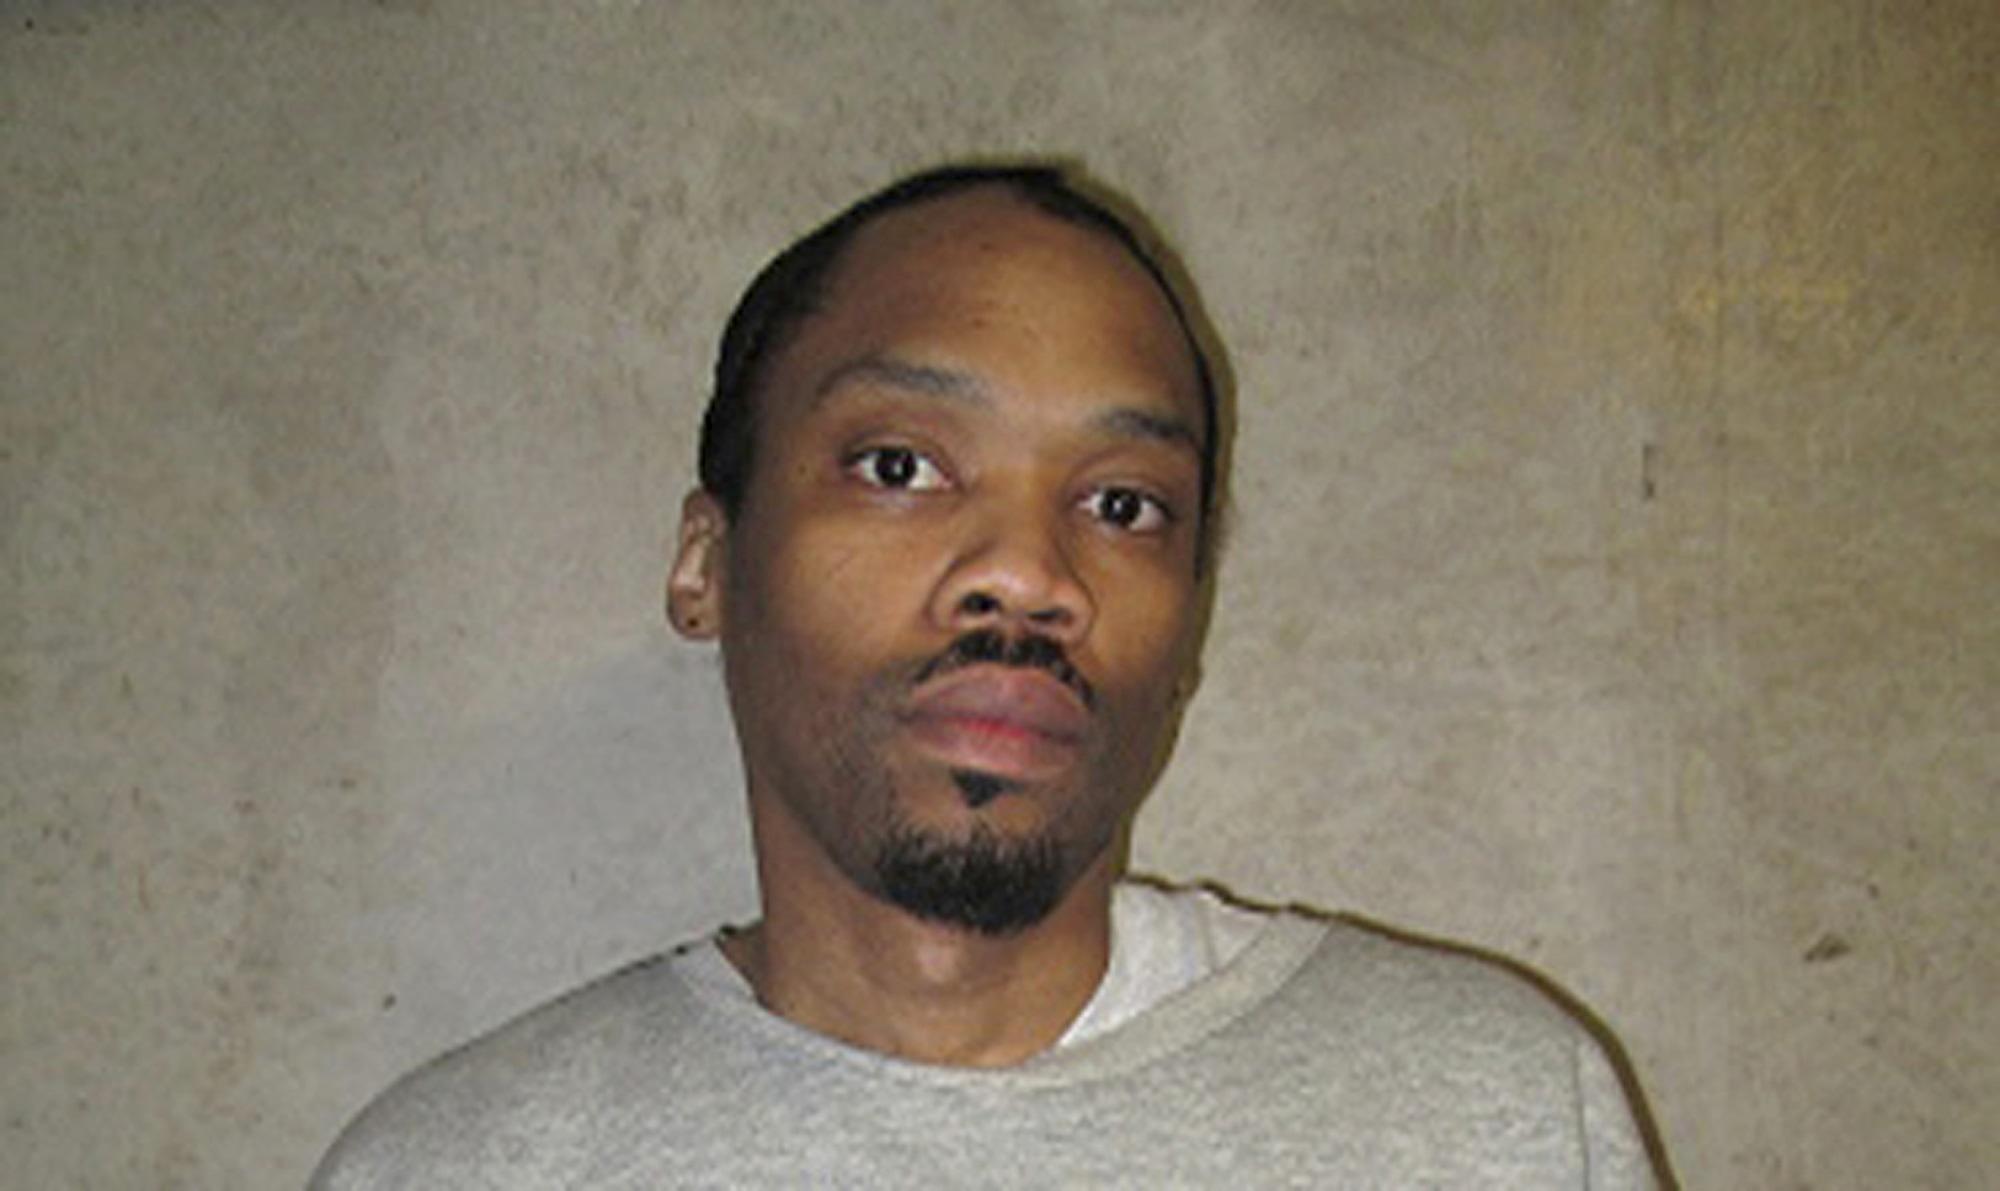 Panel Recommends Commuting Death Sentence of Julius Jones in 1999 Oklahoma Murder Case